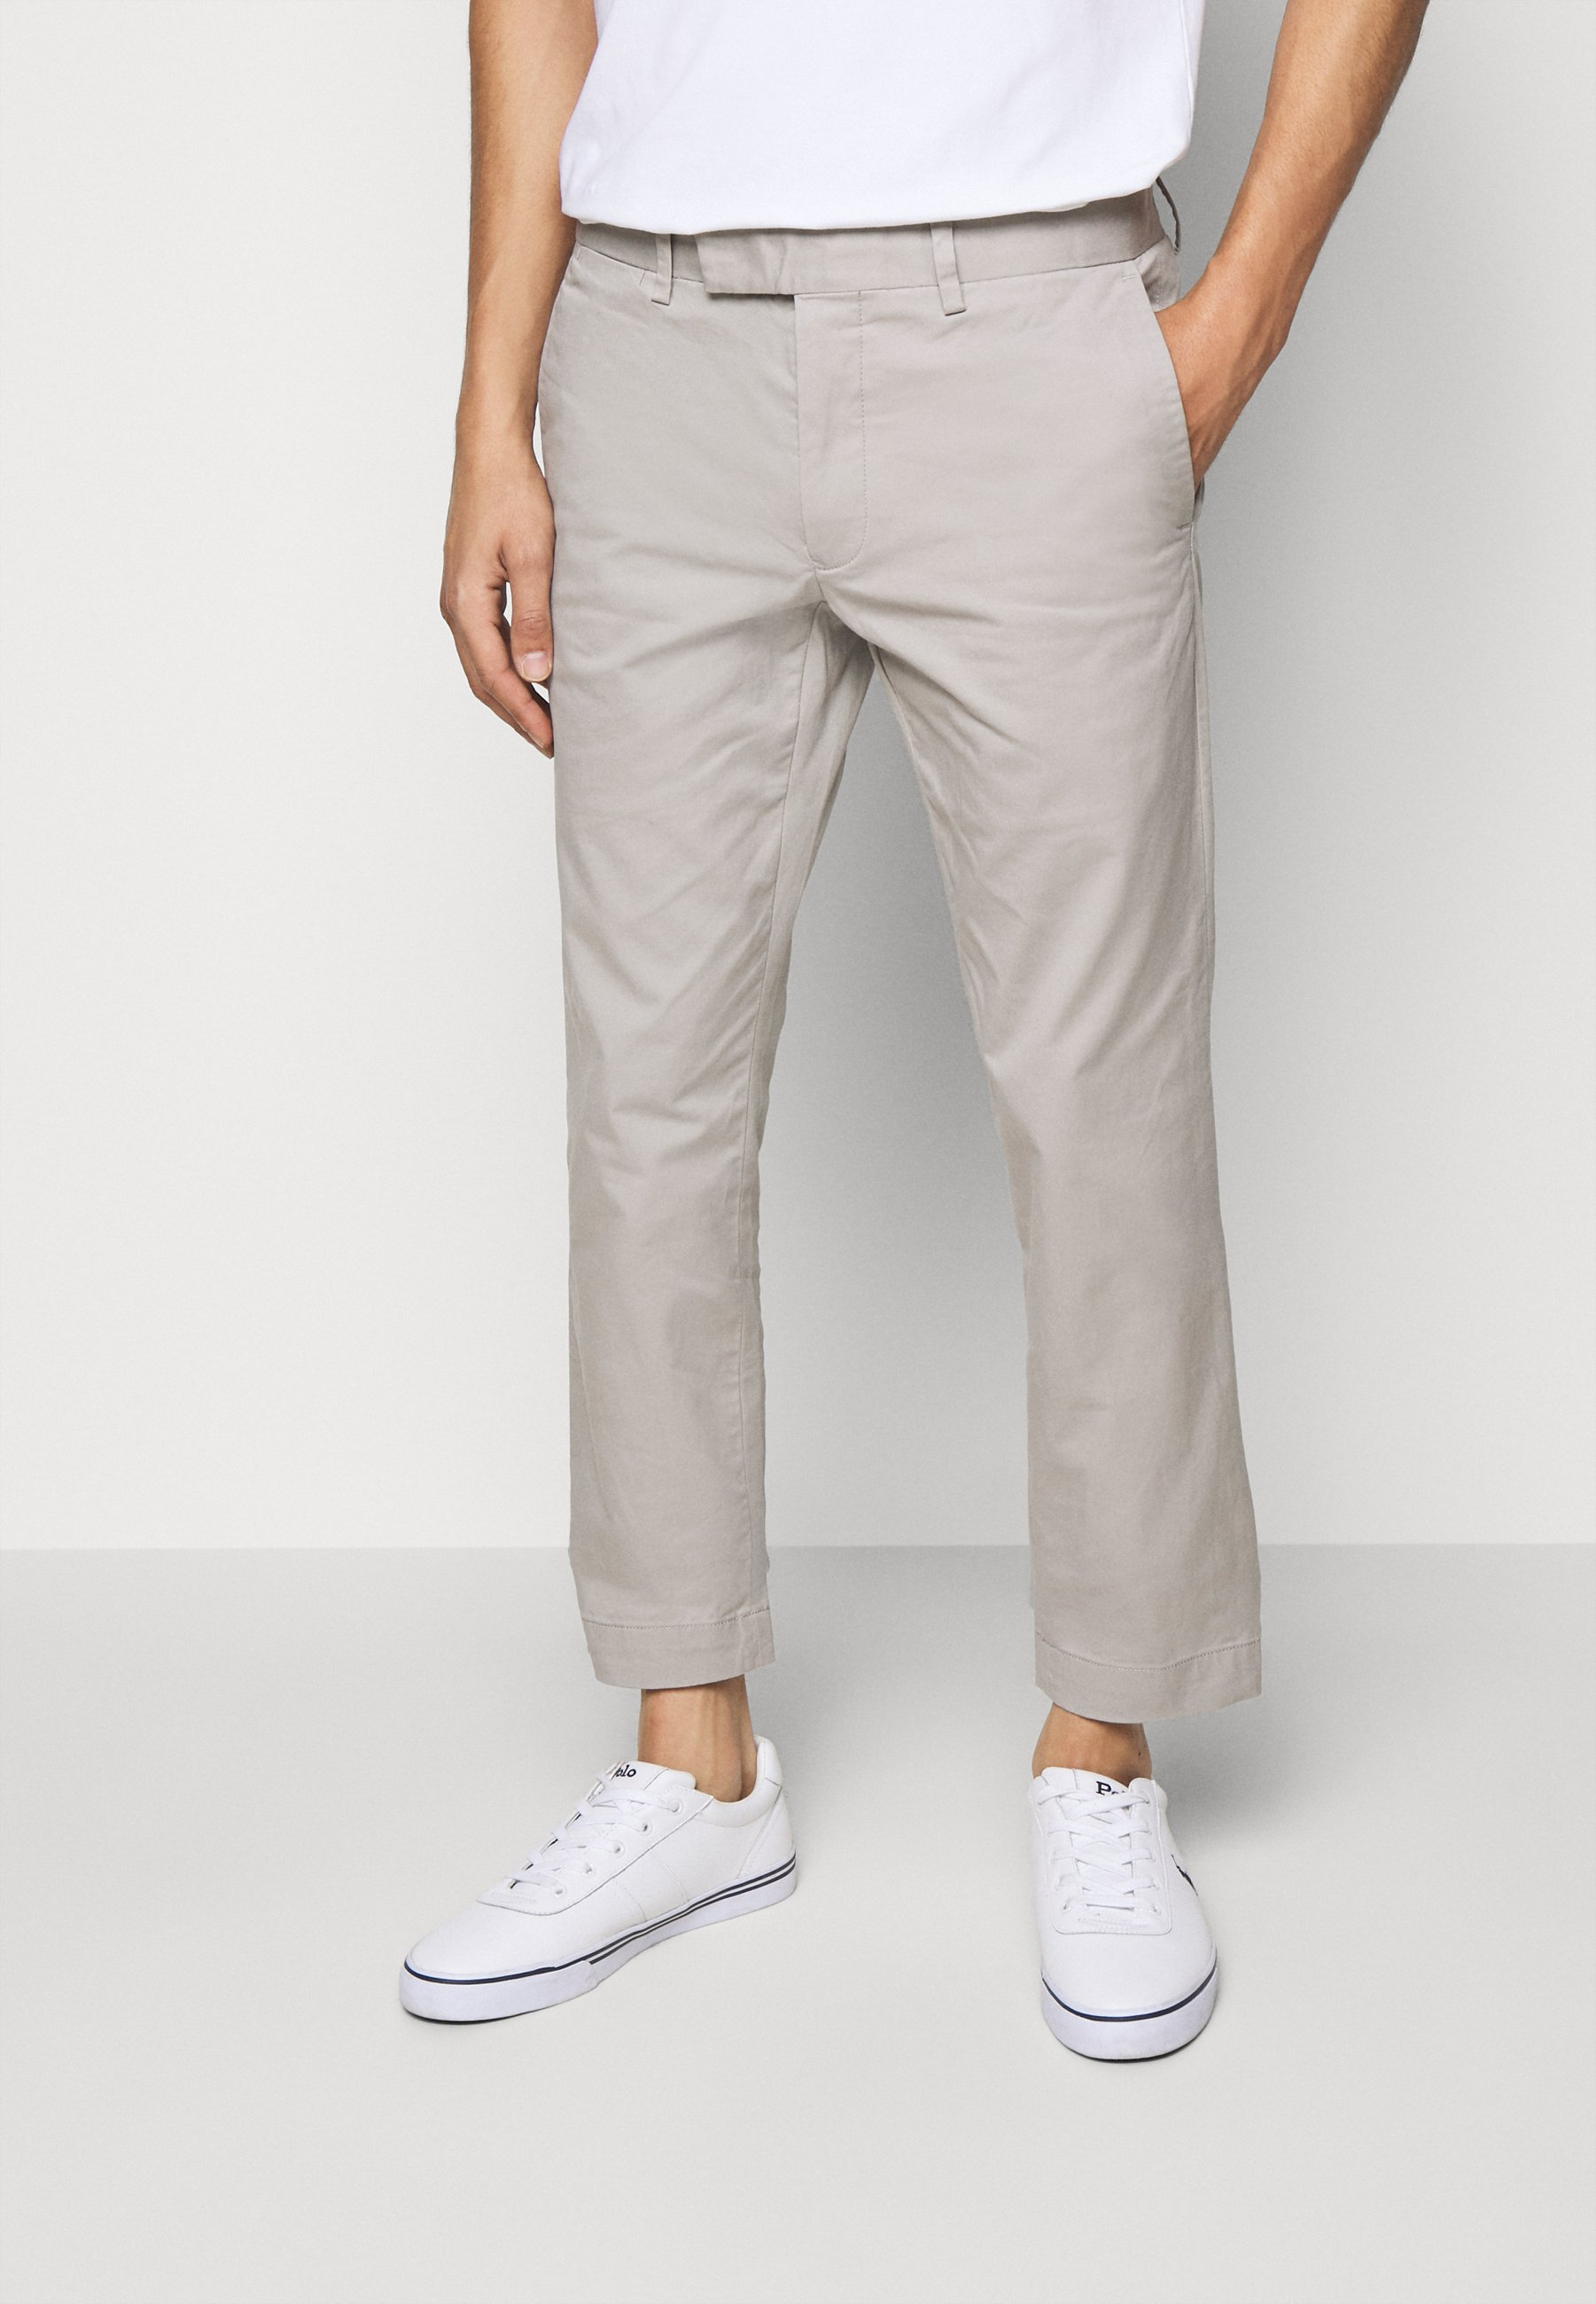 Uomo STRETCH SLIM FIT COTTON CHINO - Pantaloni